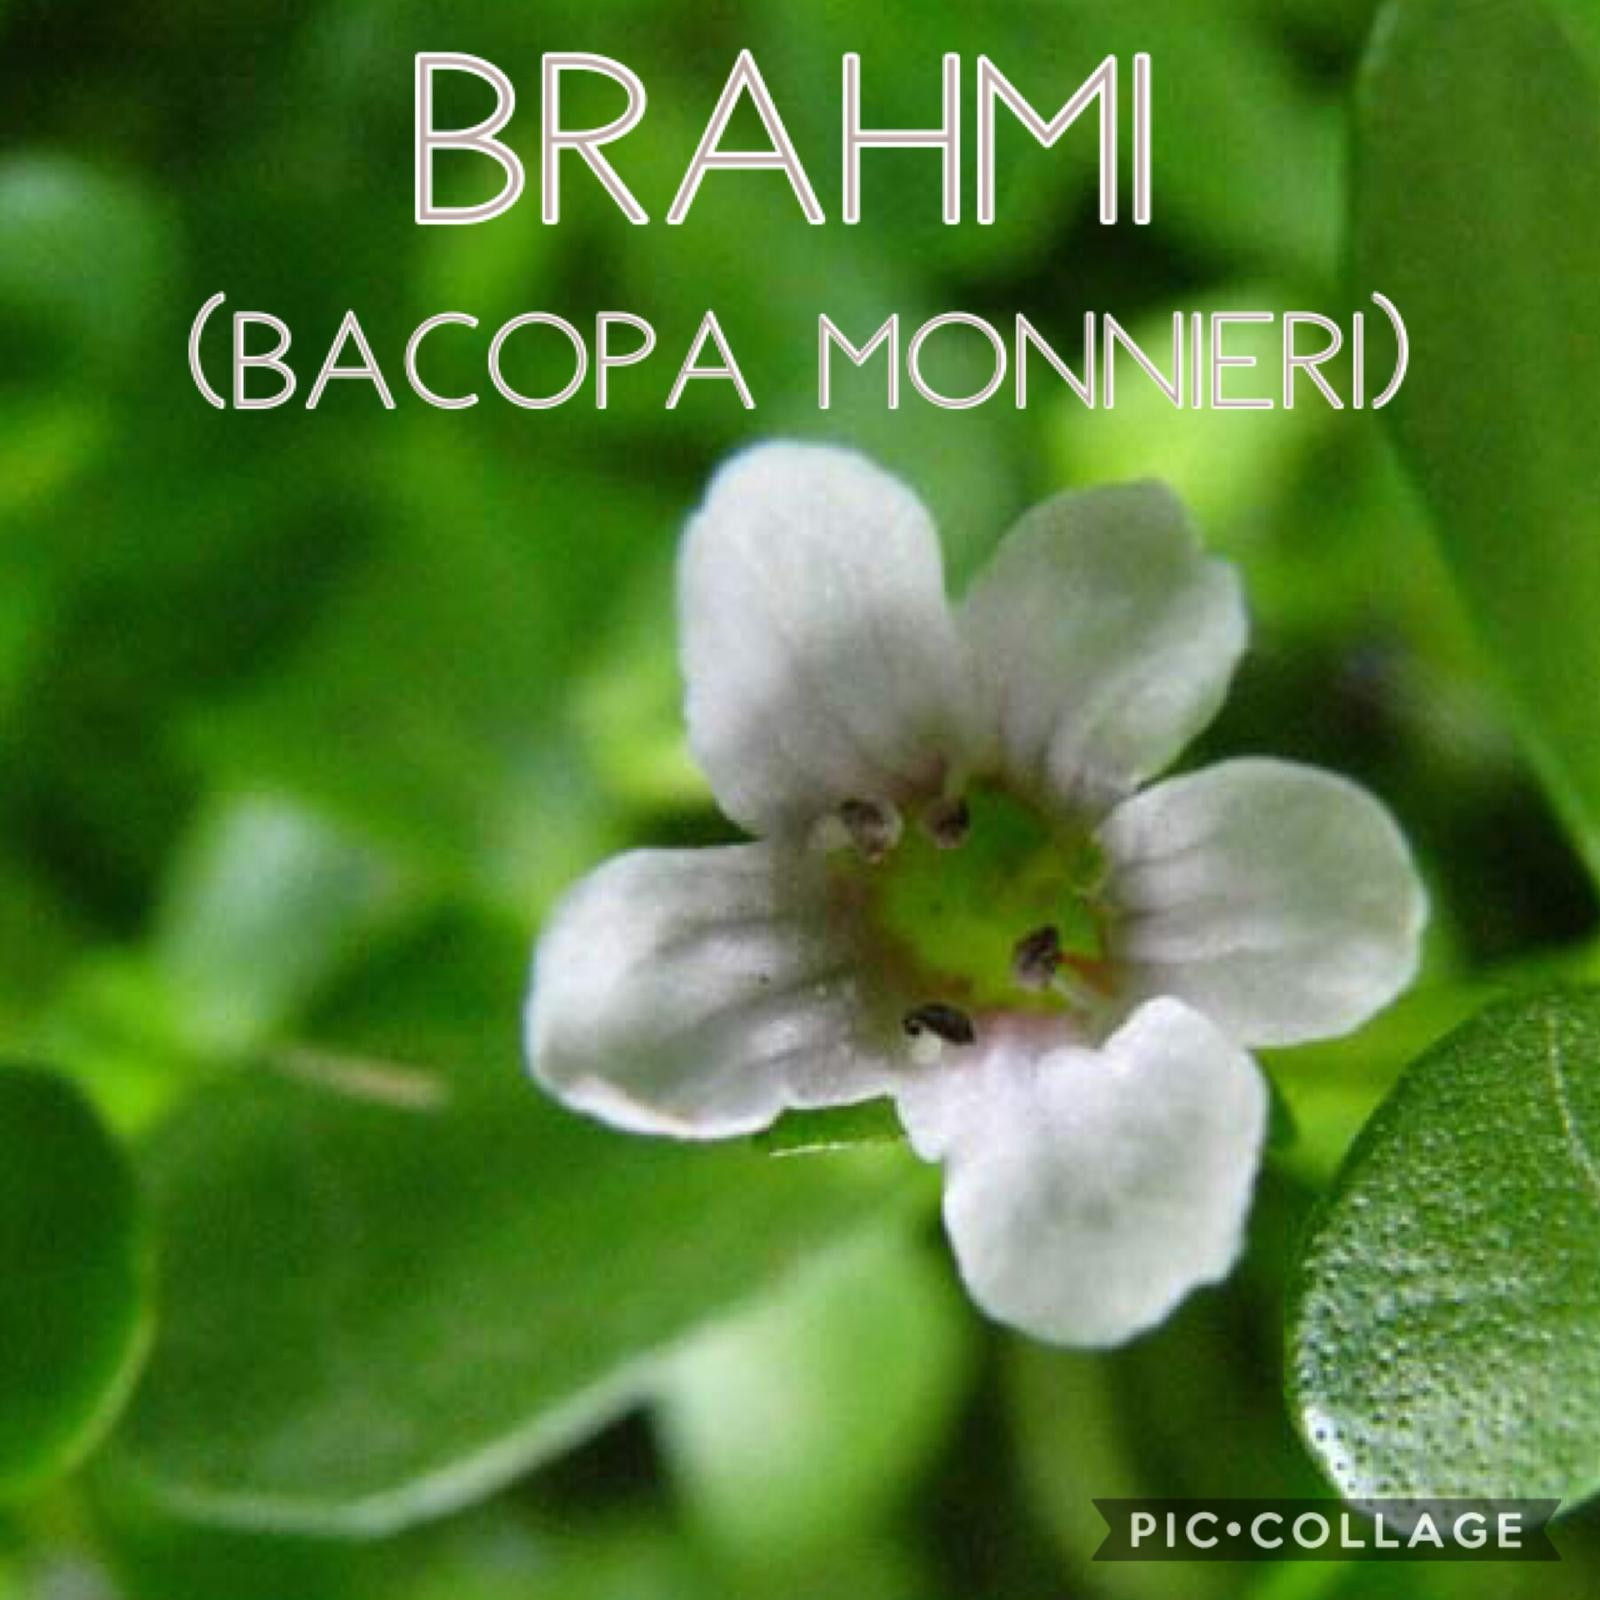 Brahmi (Bacopa Monnieri – Isopo d'acqua)